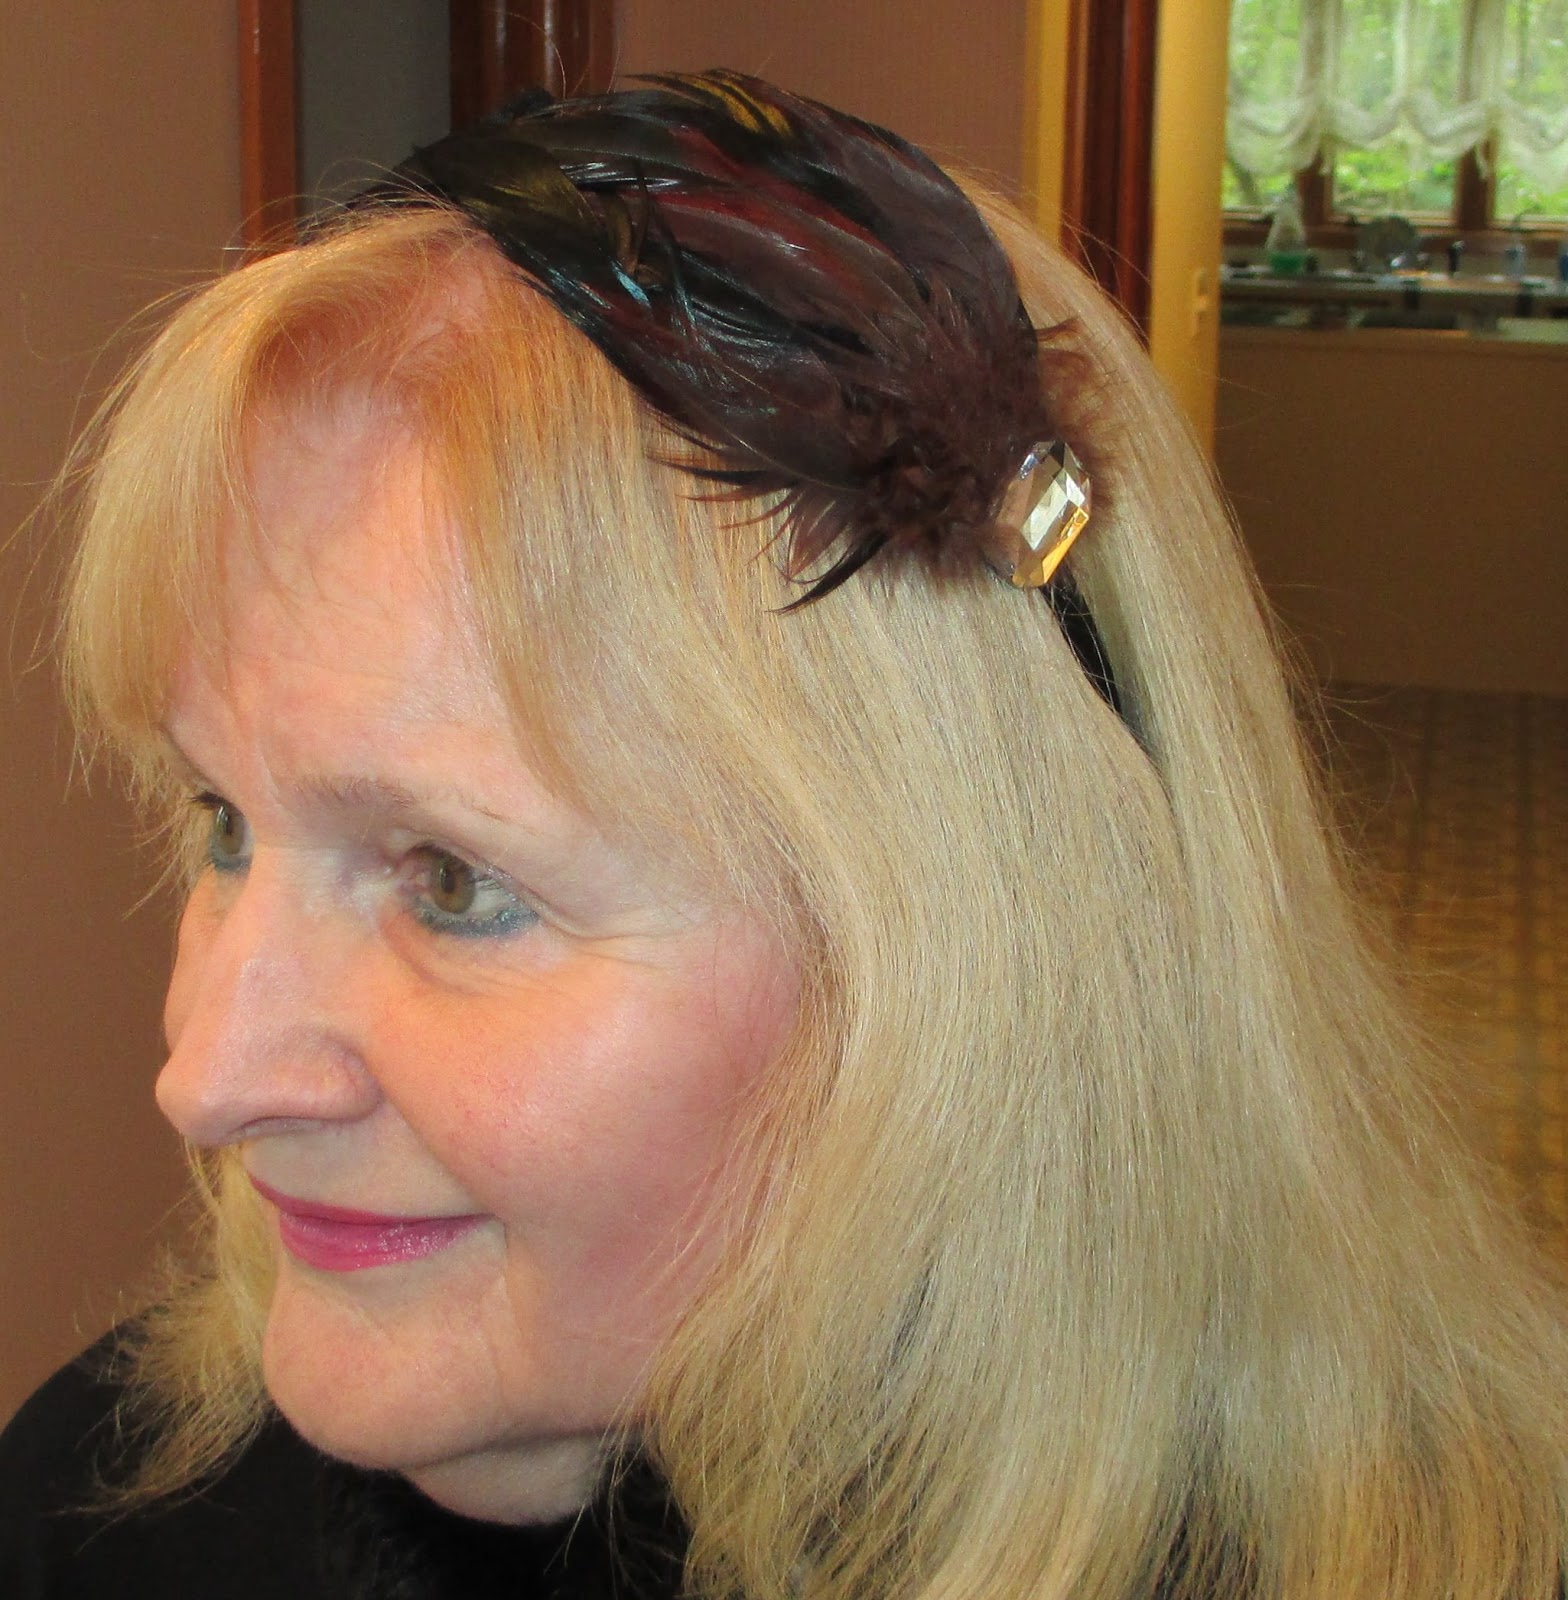 how to wear a headband across your forehead